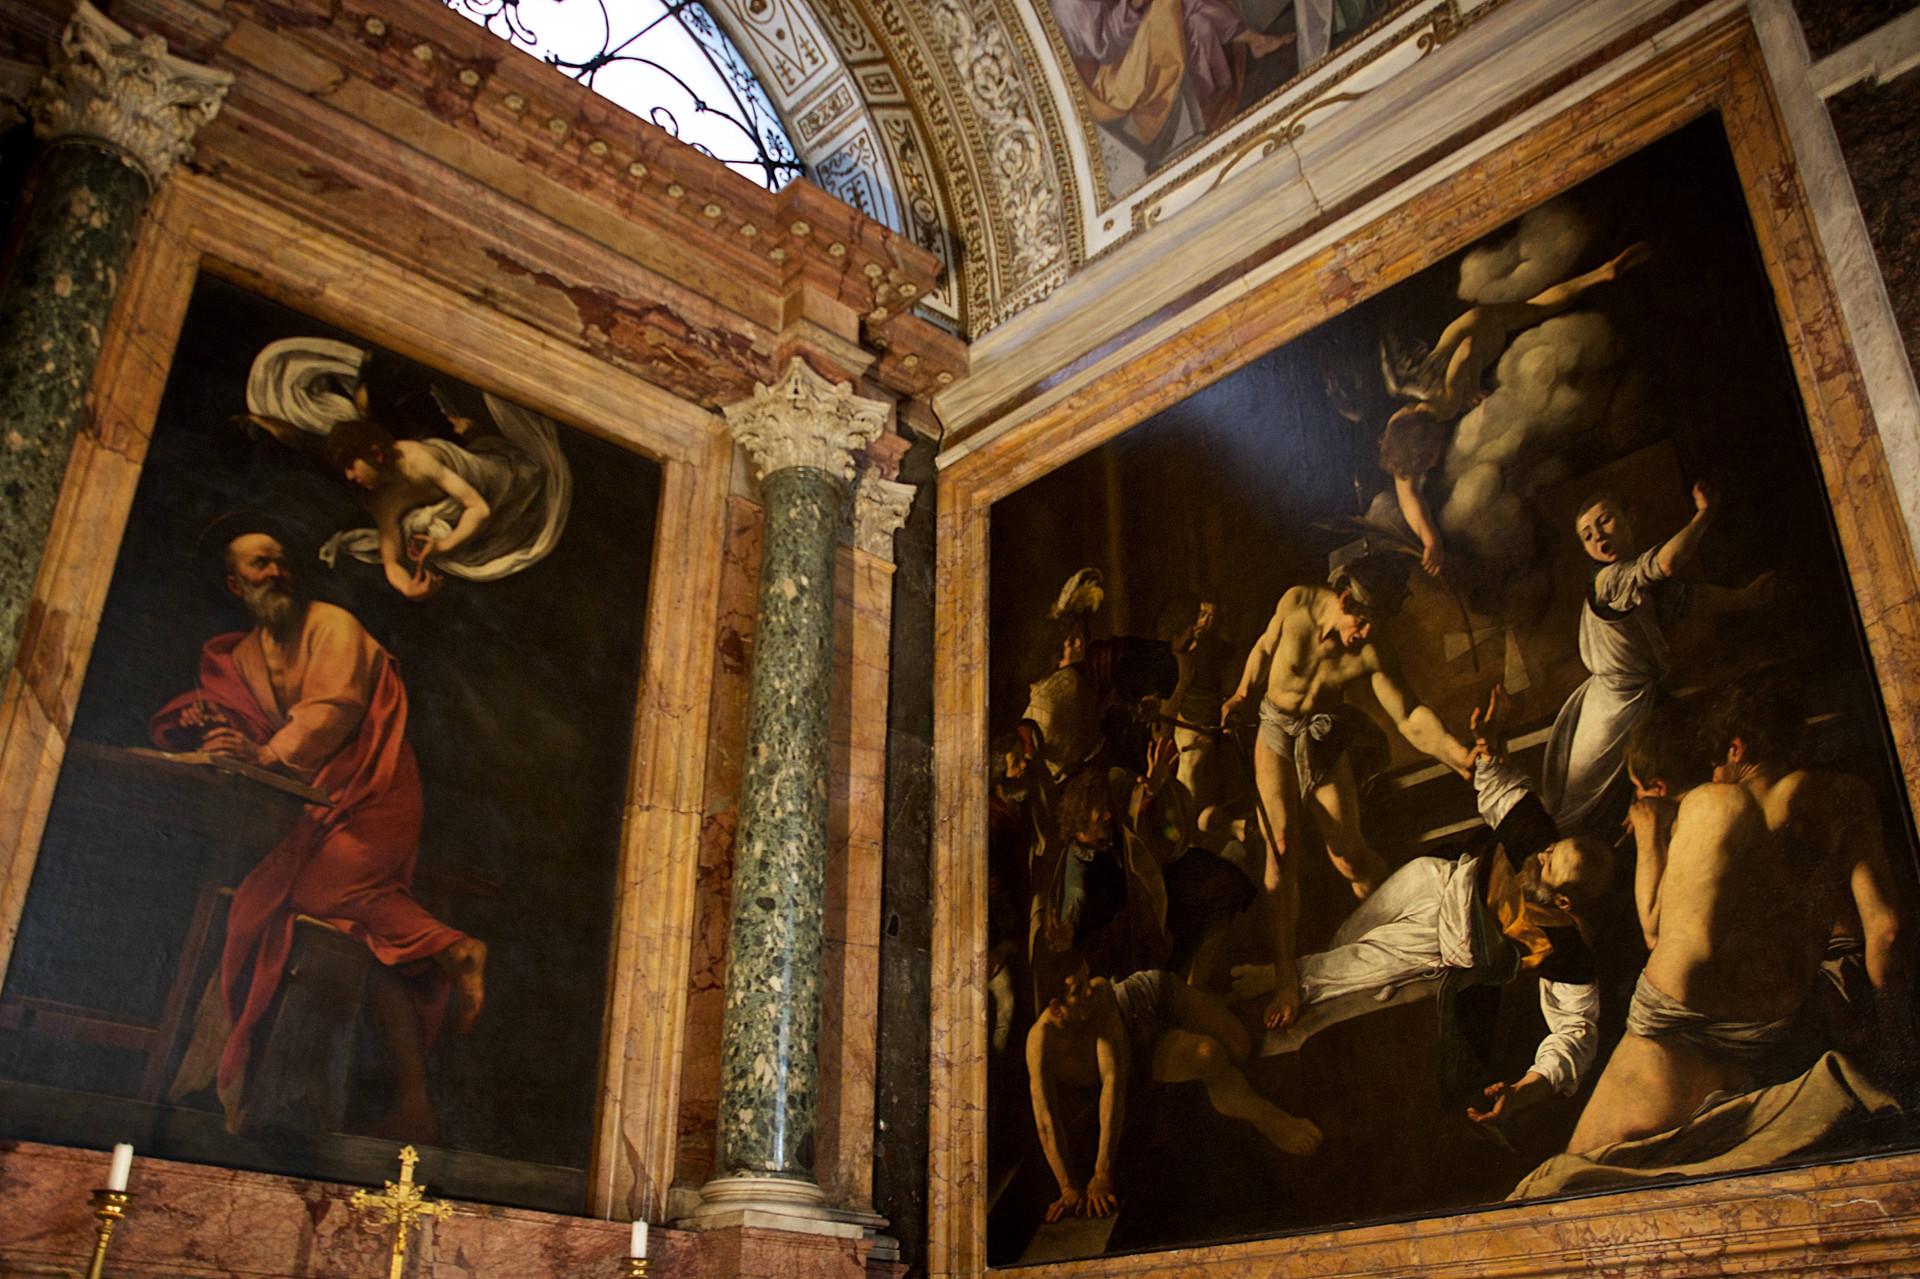 Caravaggio's paintings, Rome